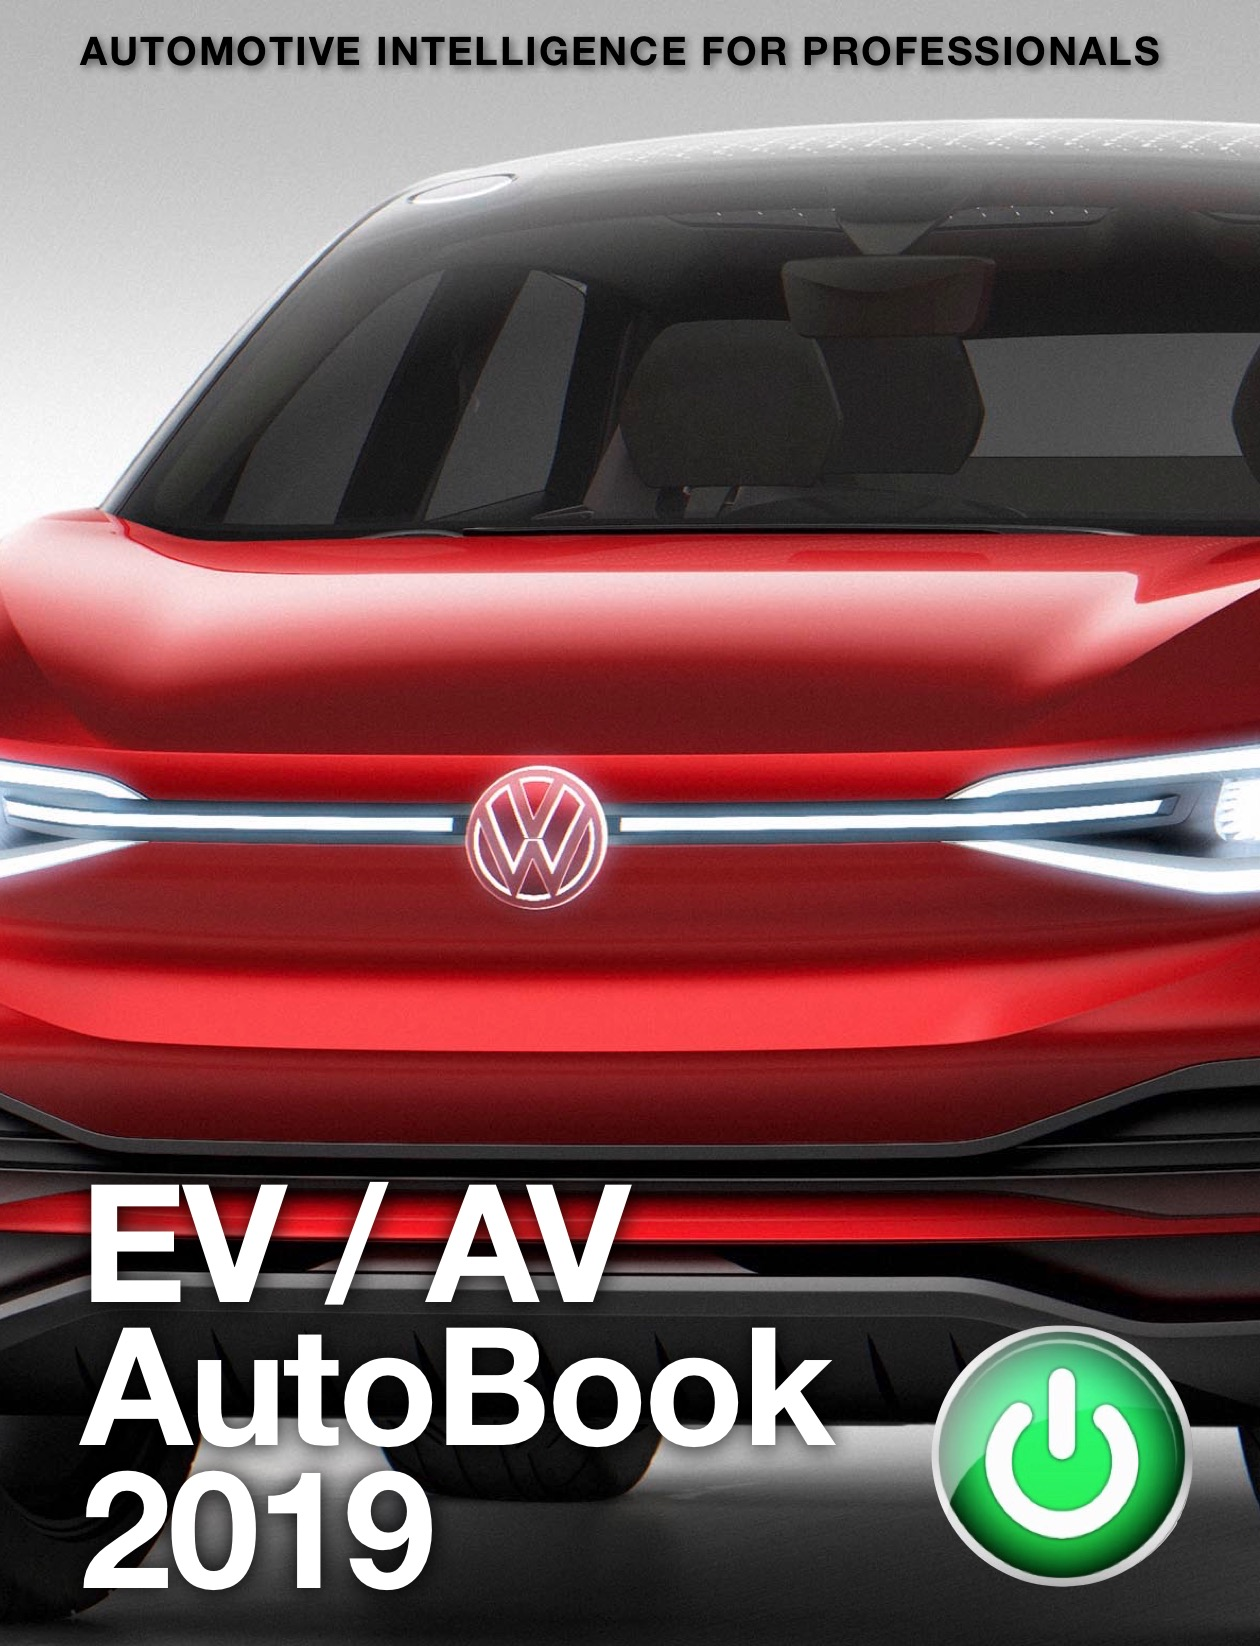 EV AutoBook 2019 Cover.jpg